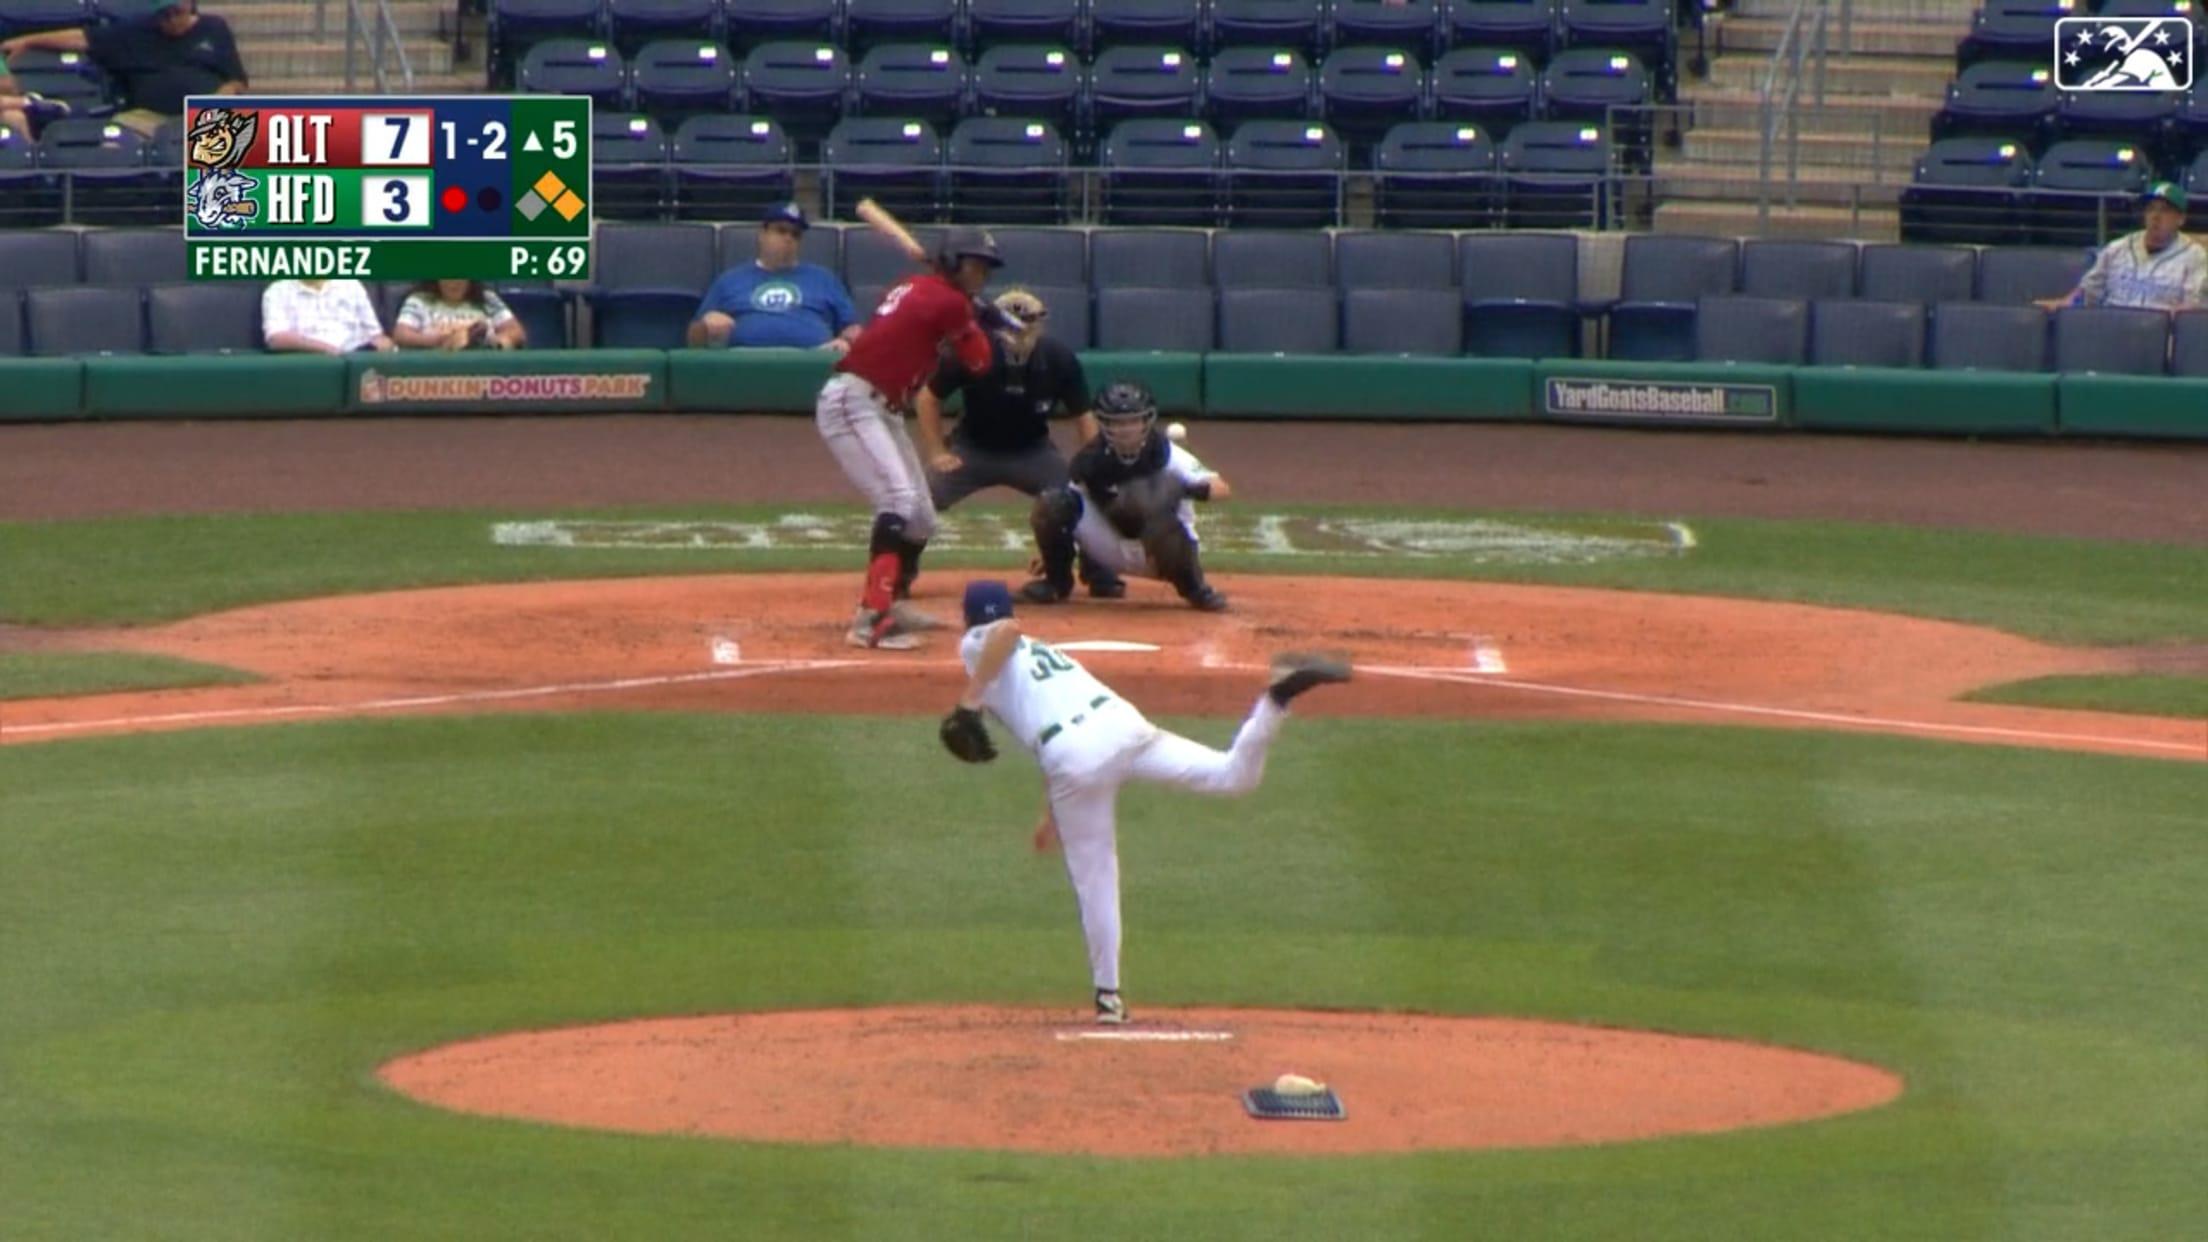 Oneil Cruz's three-run home run